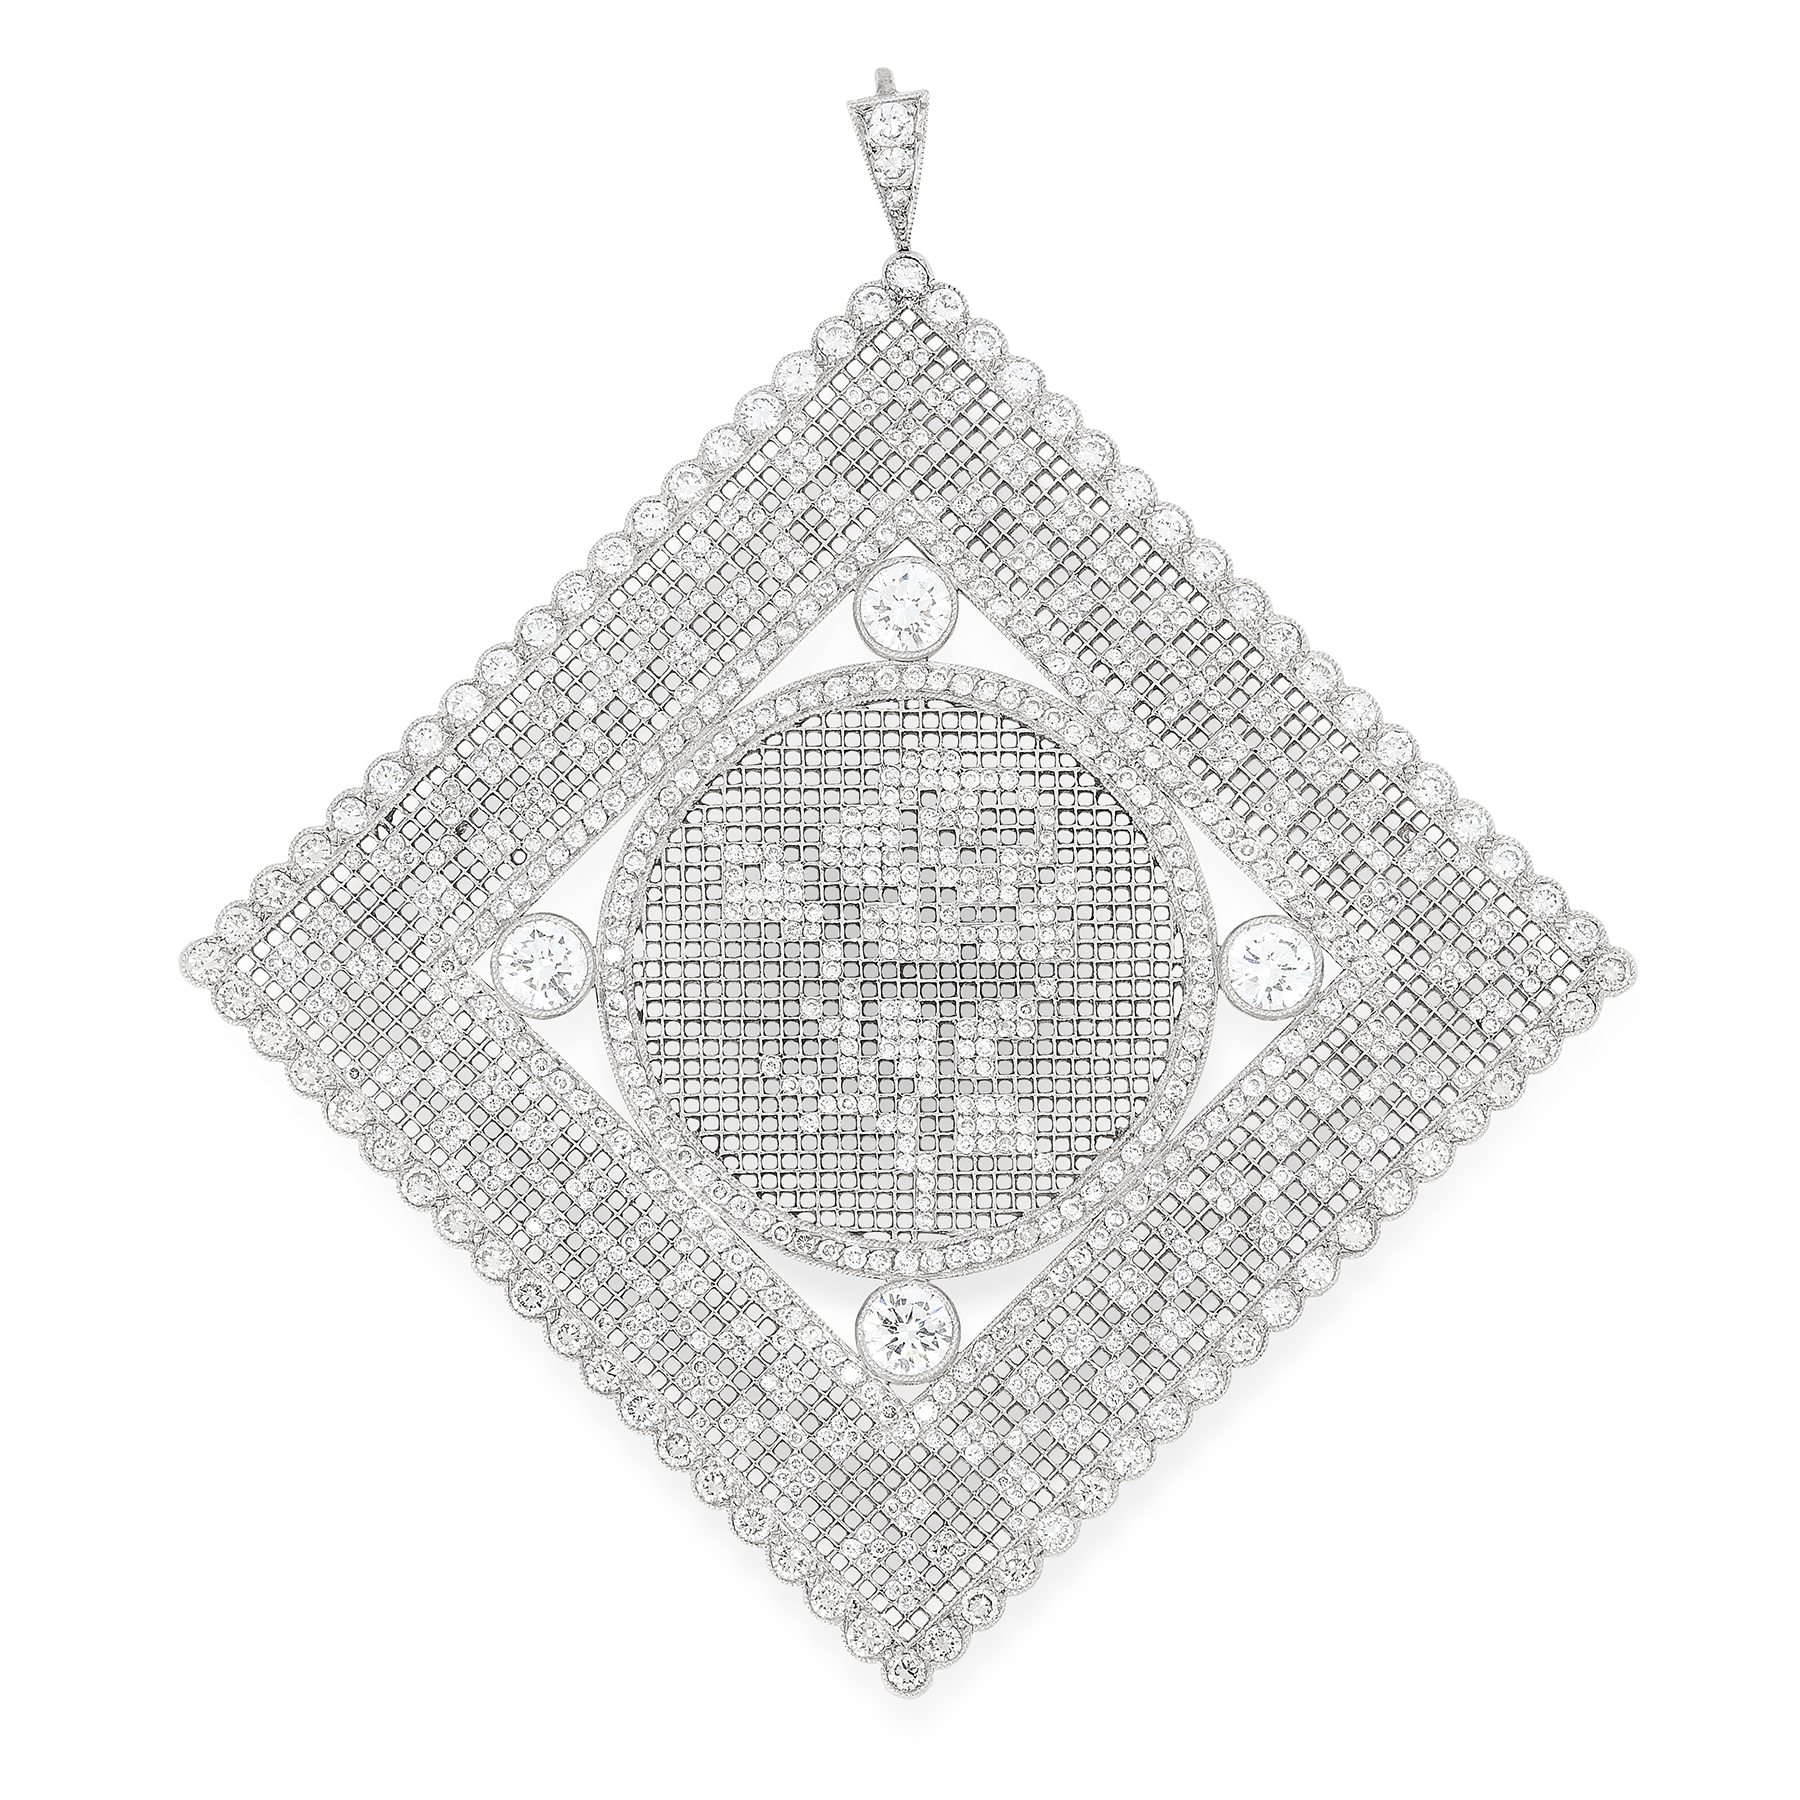 Lot 28 - A DIAMOND PENDANT the large square body of lattice design inset with four principal round cut